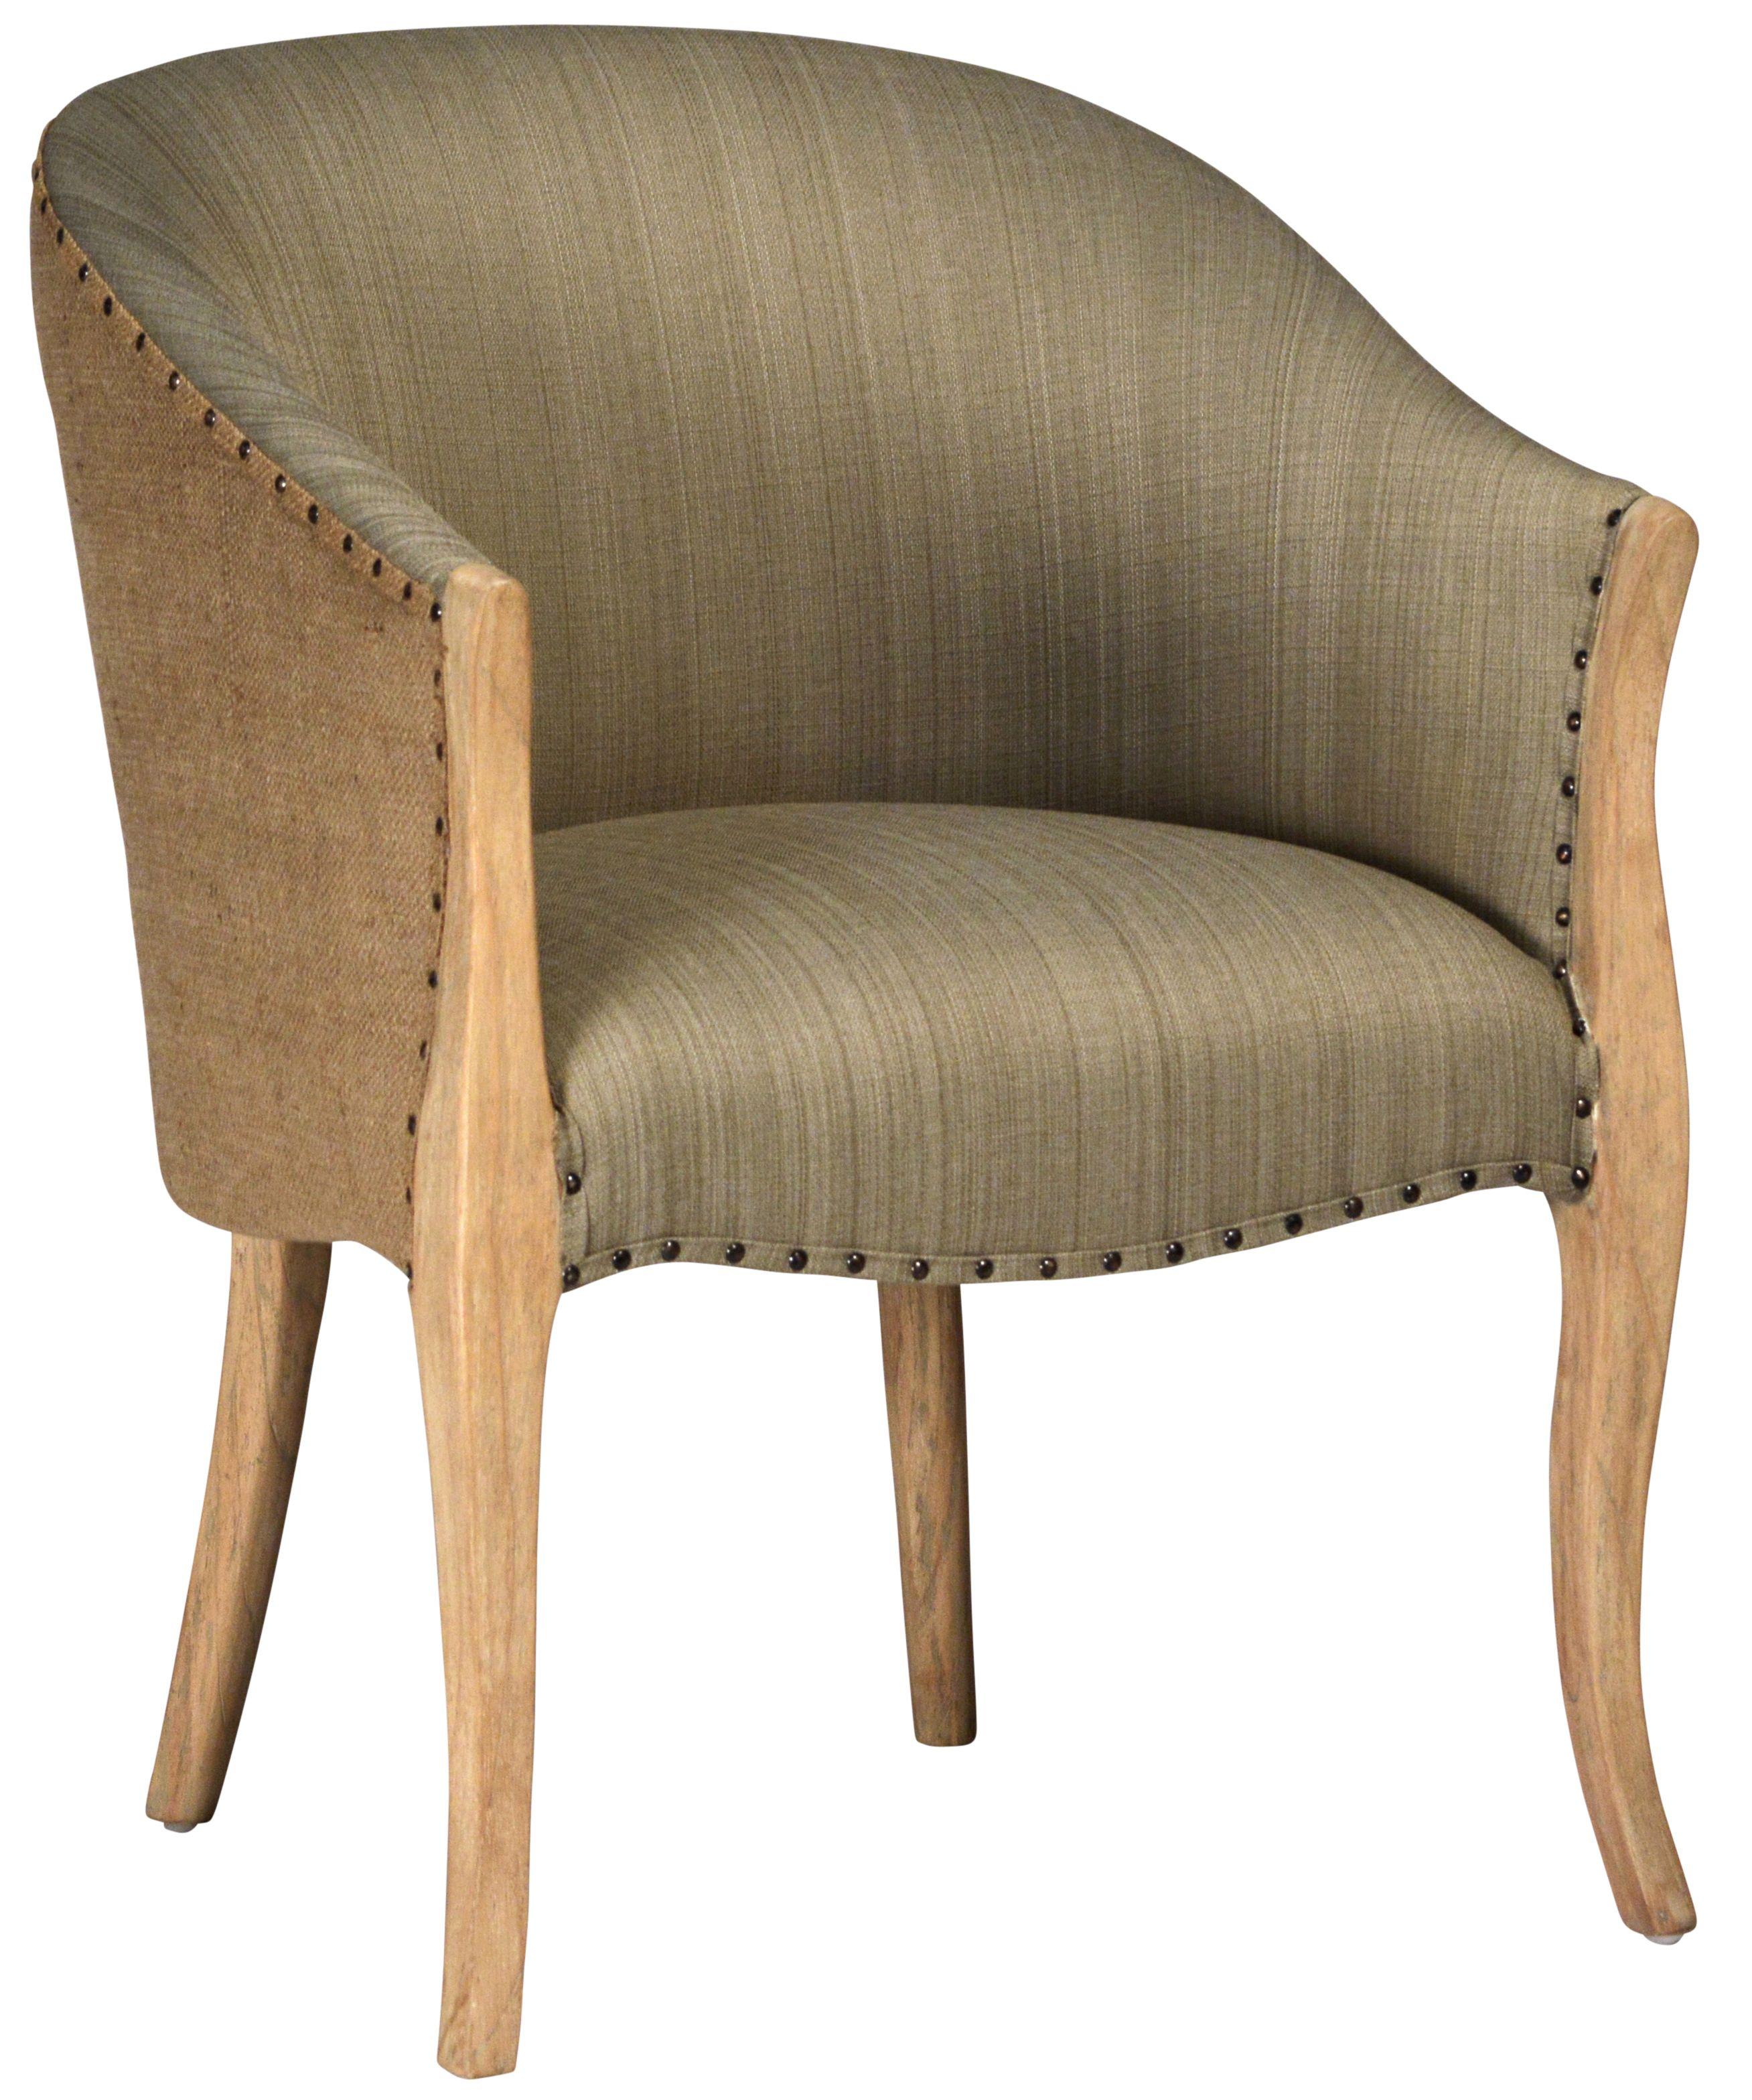 Ordinaire Dovetail Furniture U0026 Designs, G 7031, G 7039   Suites At Market Square,  SALON Http://www.dovetailfurnitureonline.com/ #DesignonHPMkt #HPMKT